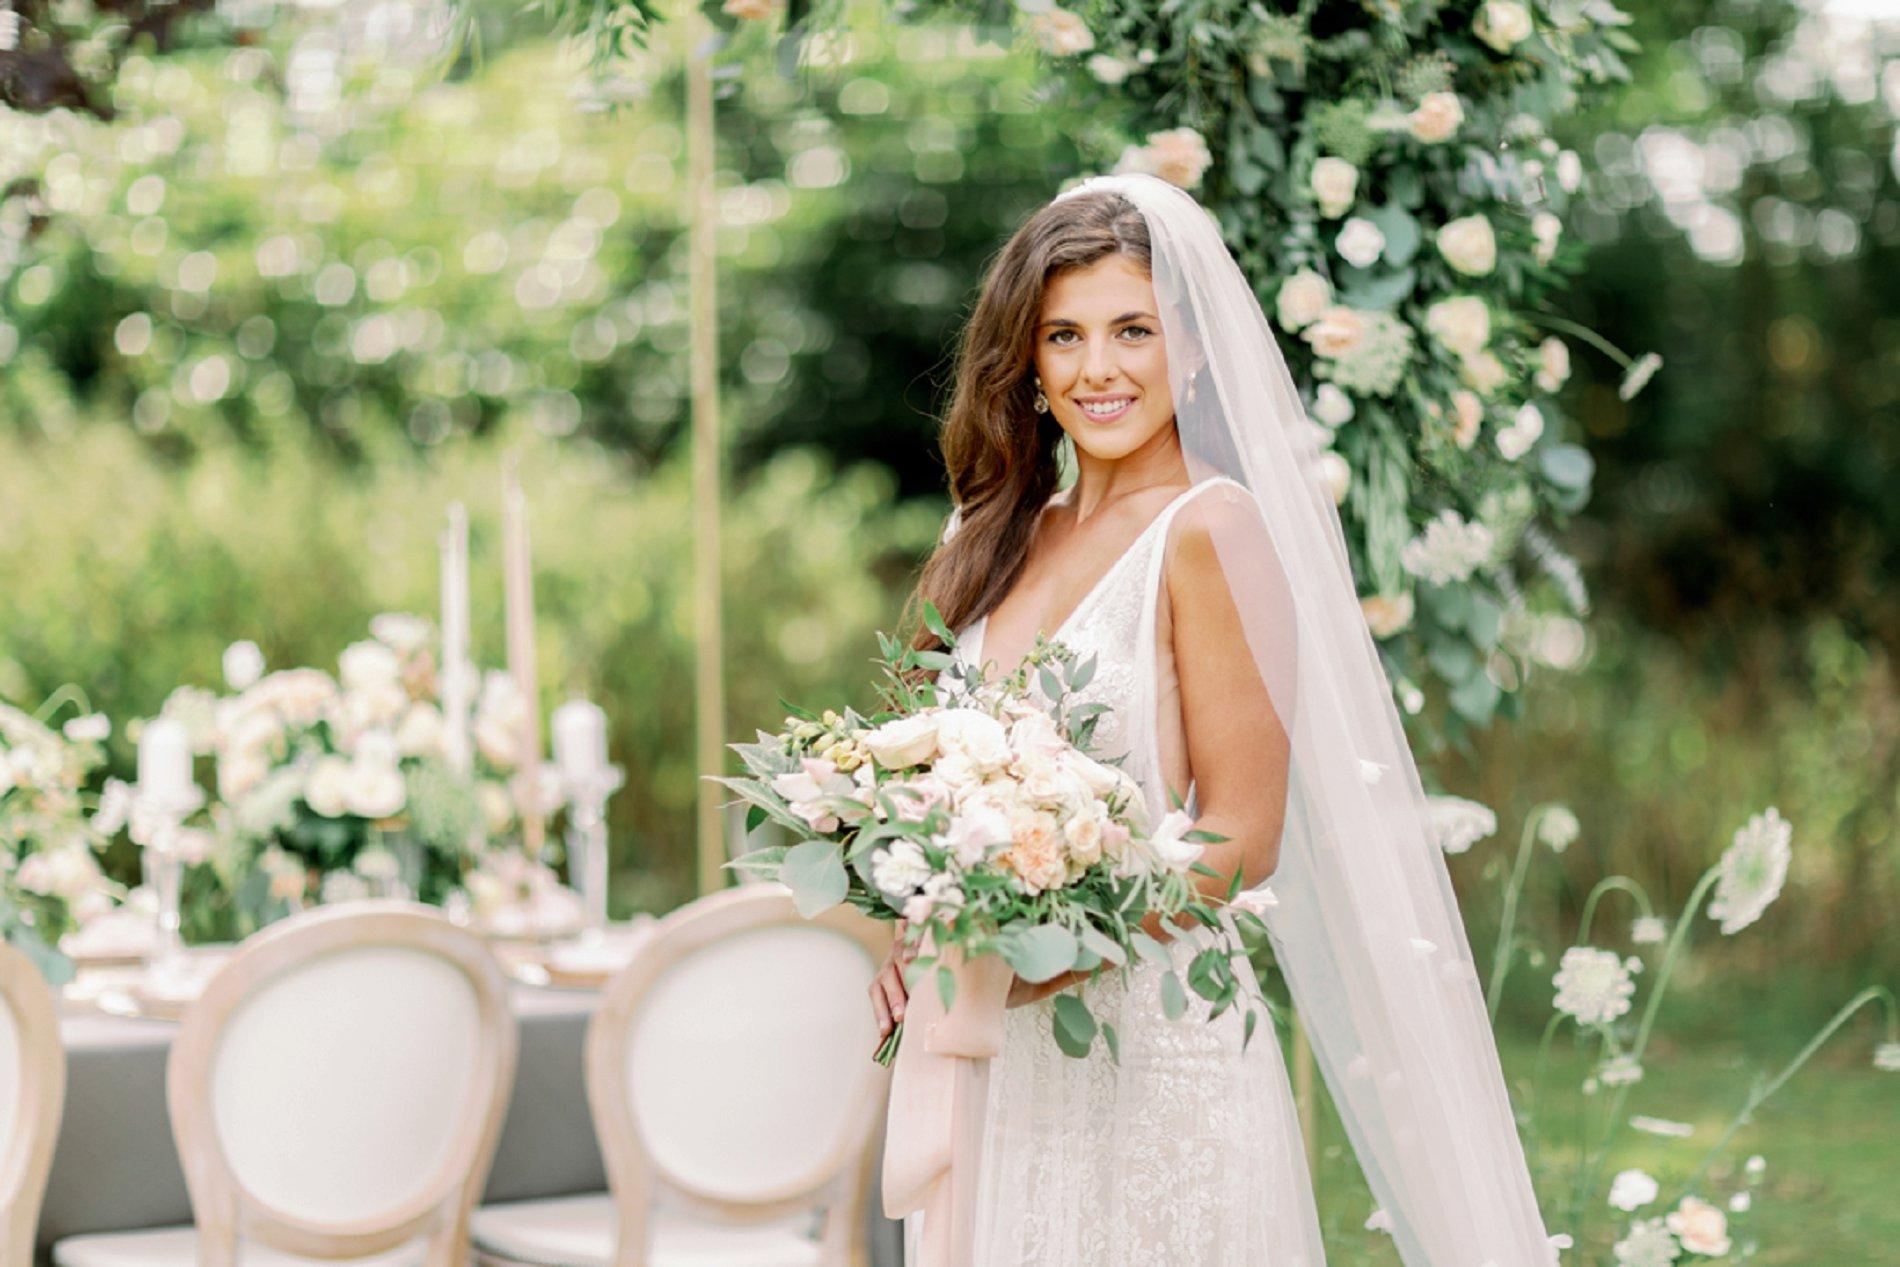 An Elegant Styled Shoot at Baddow Park House (c) Camilla J Hards (31)